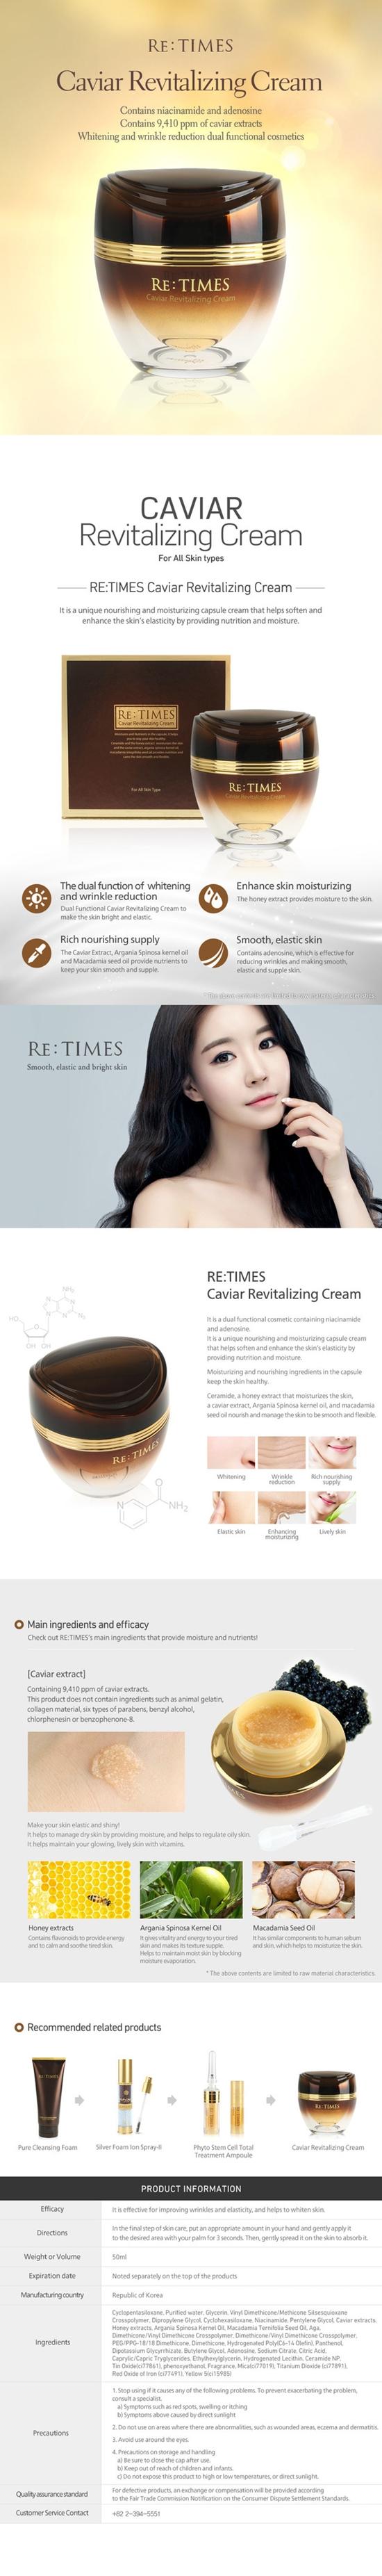 retimes-caviar-cream-en.jpg